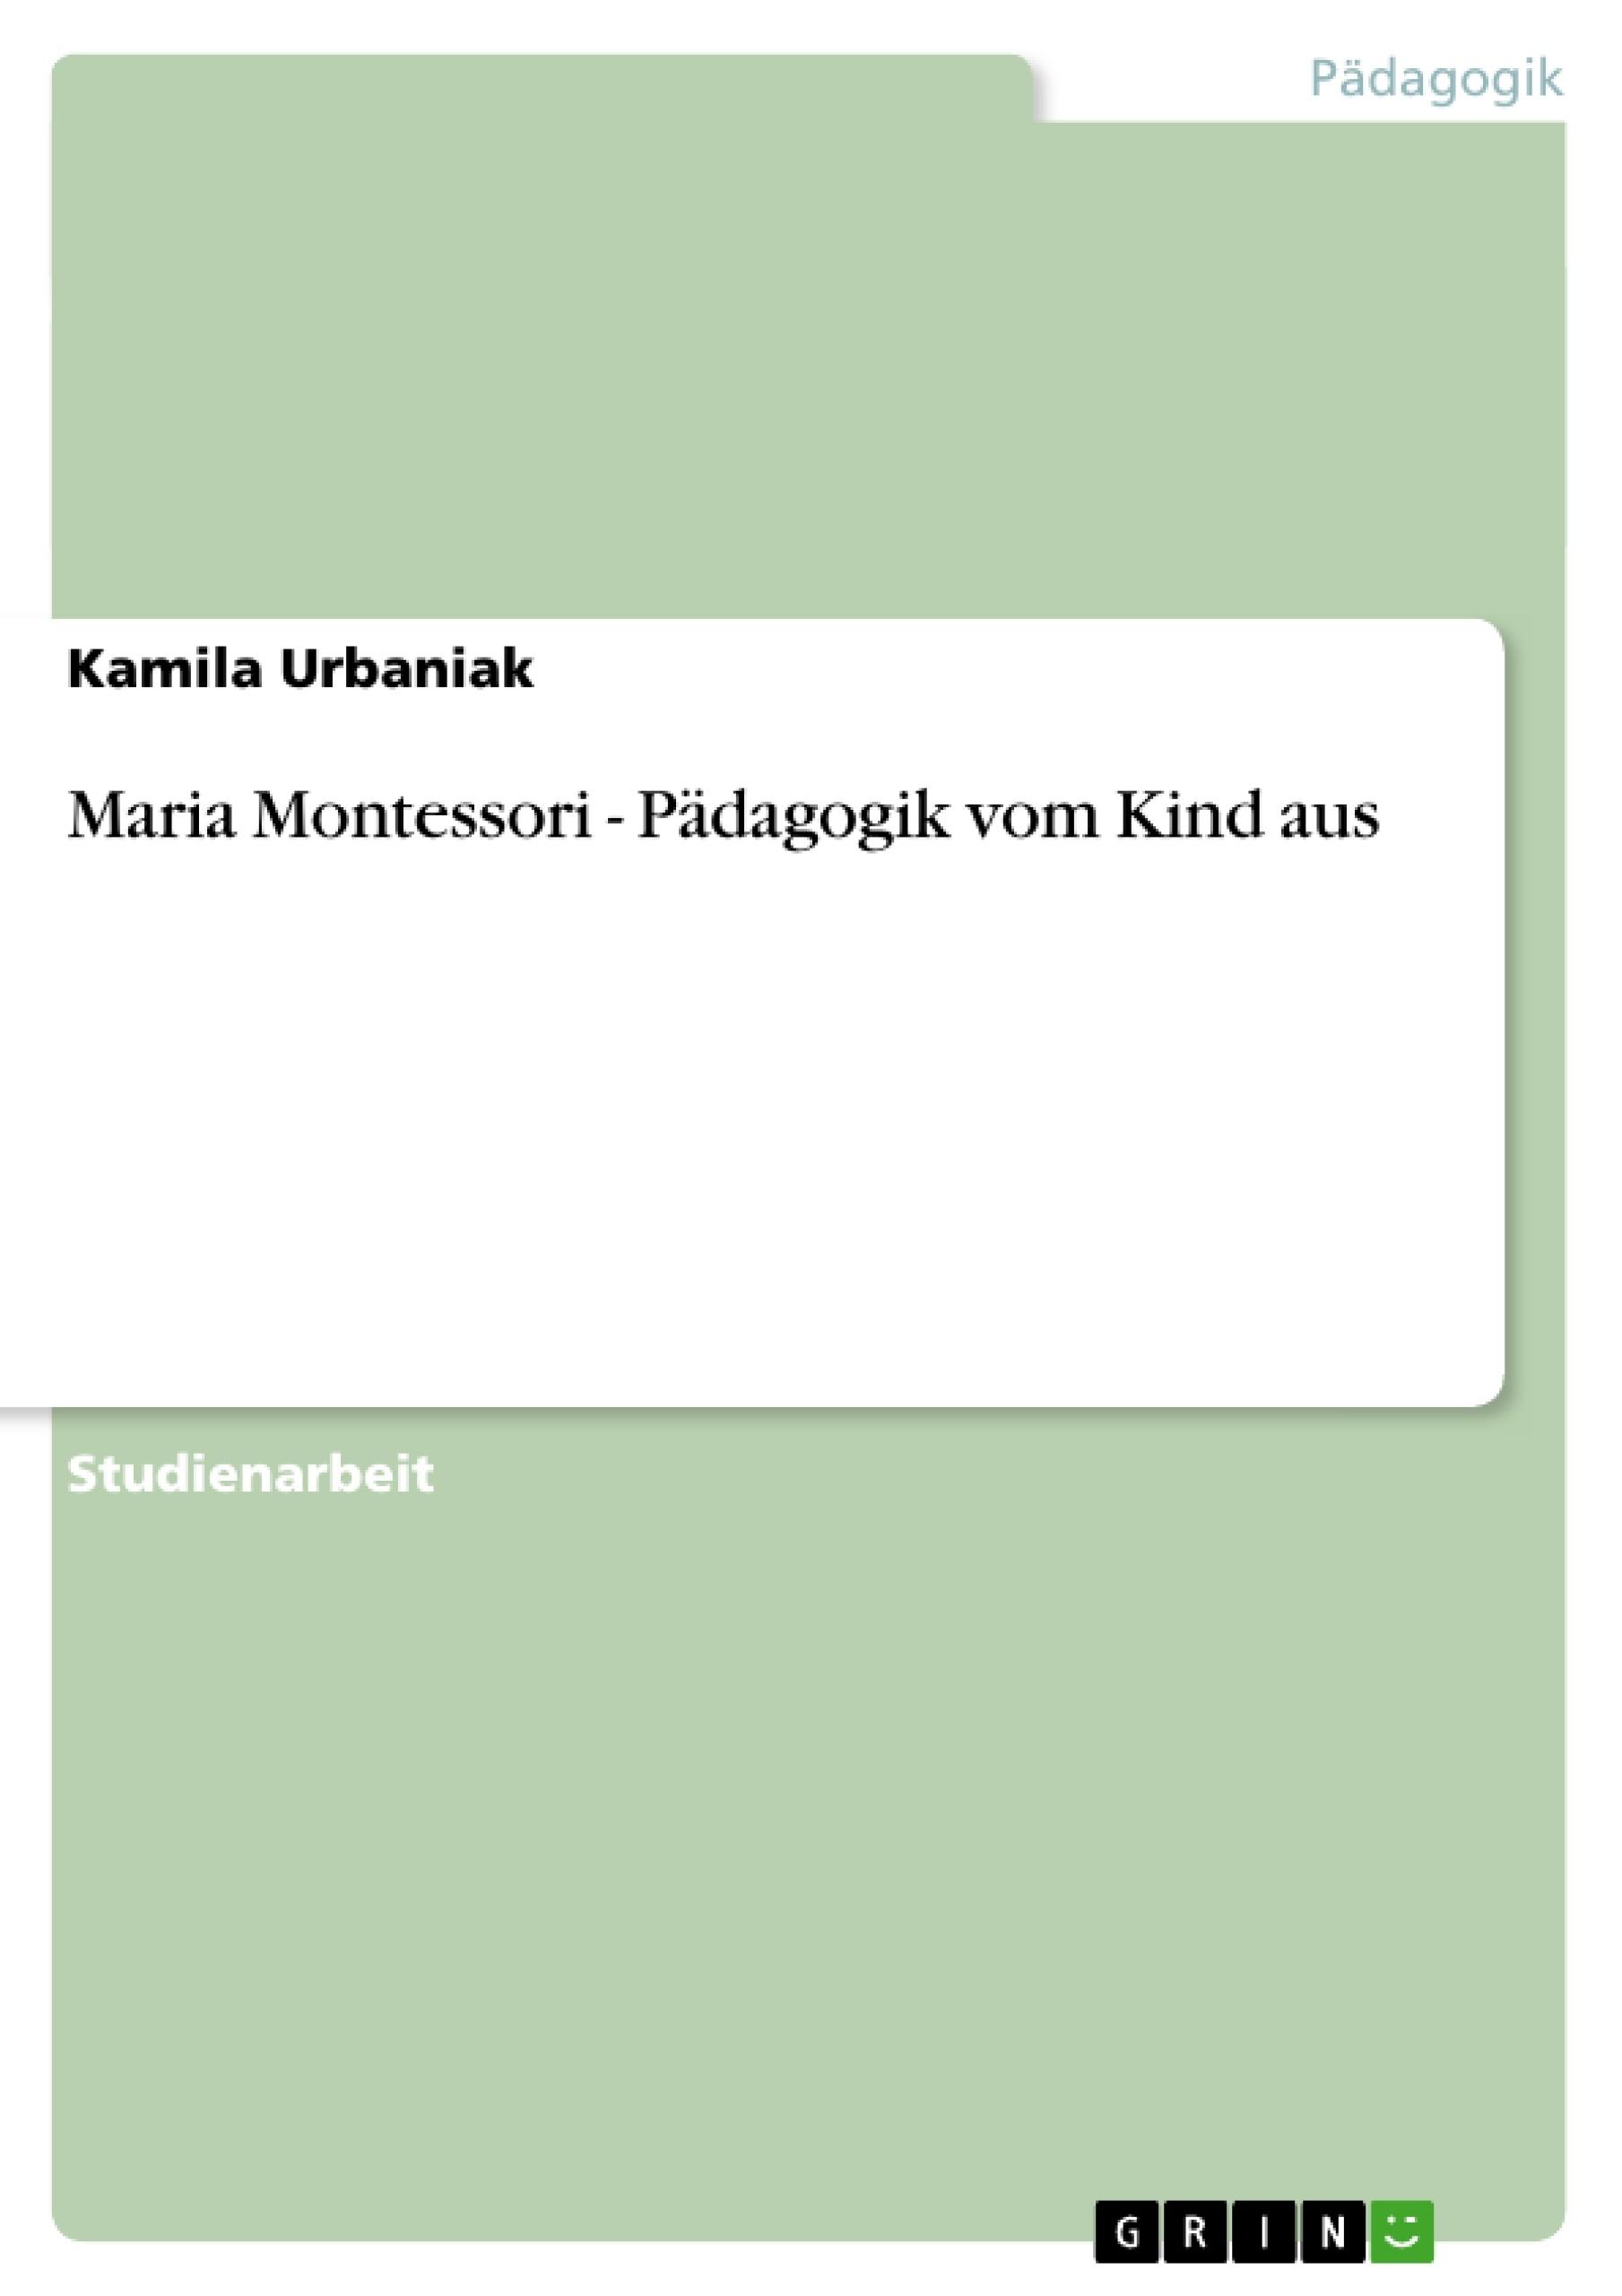 Titel: Maria Montessori - Pädagogik vom Kind aus